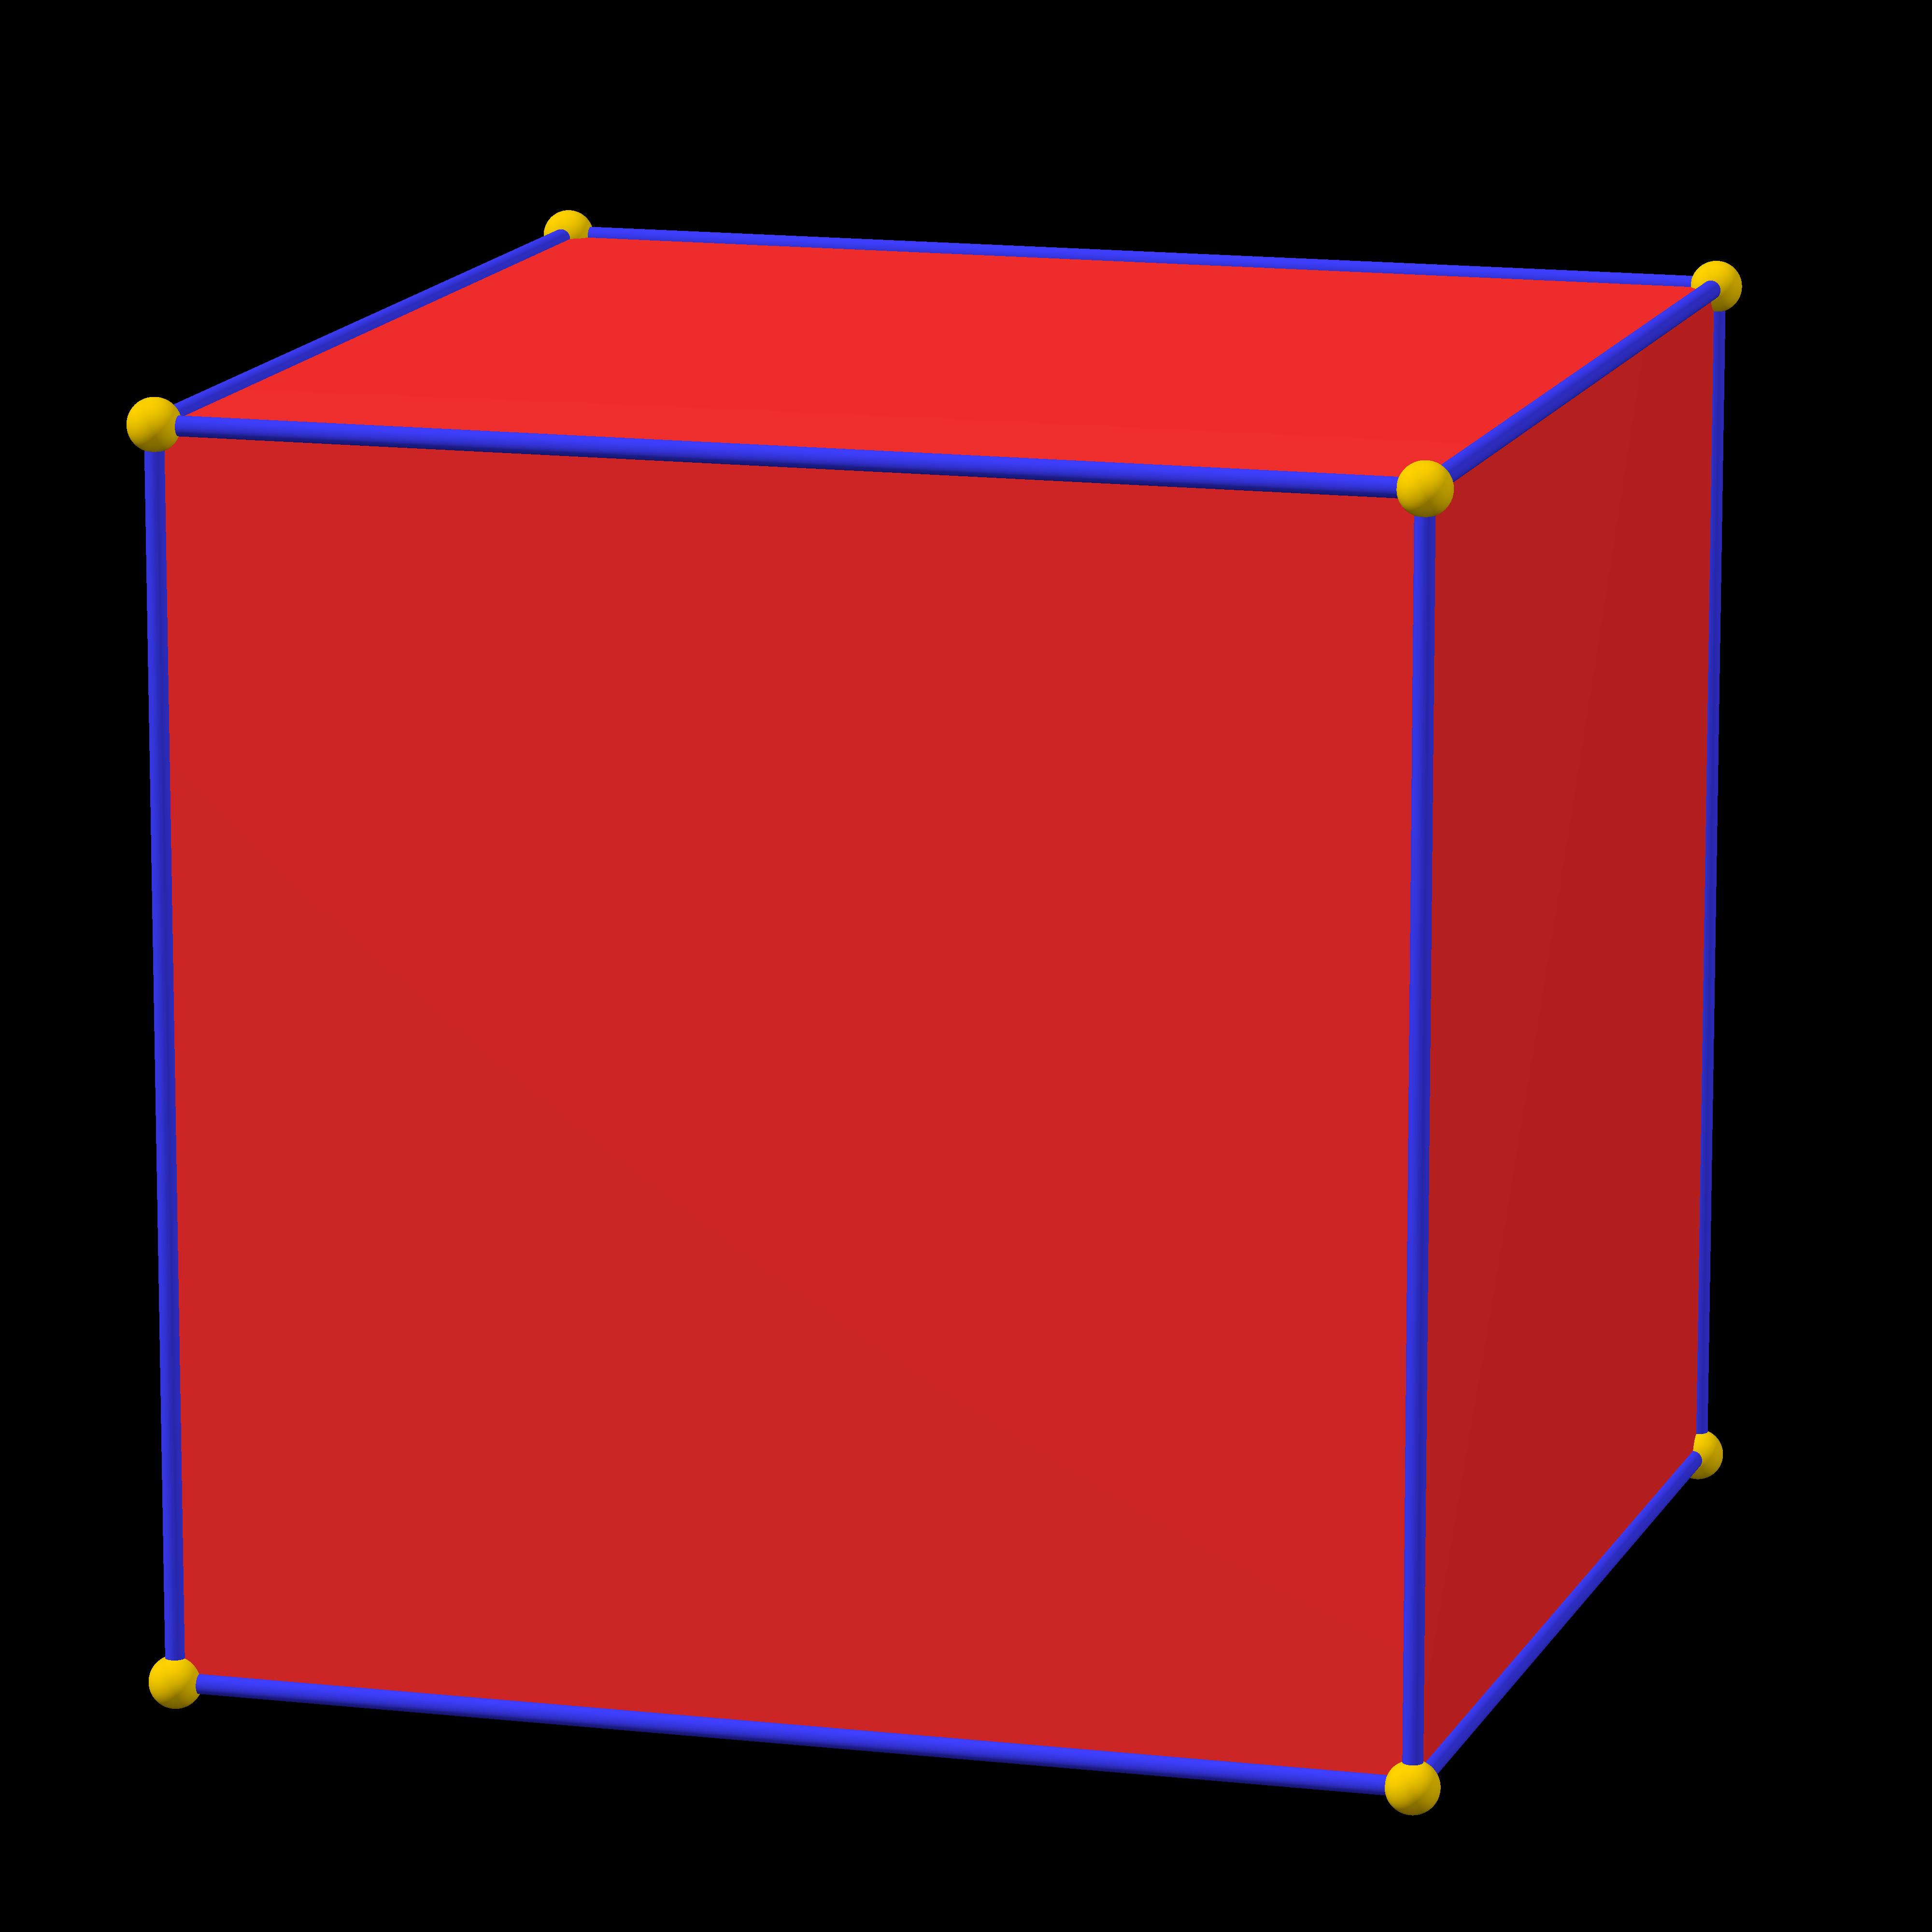 Chamfer geometry wikiwand . Cube clipart congruent